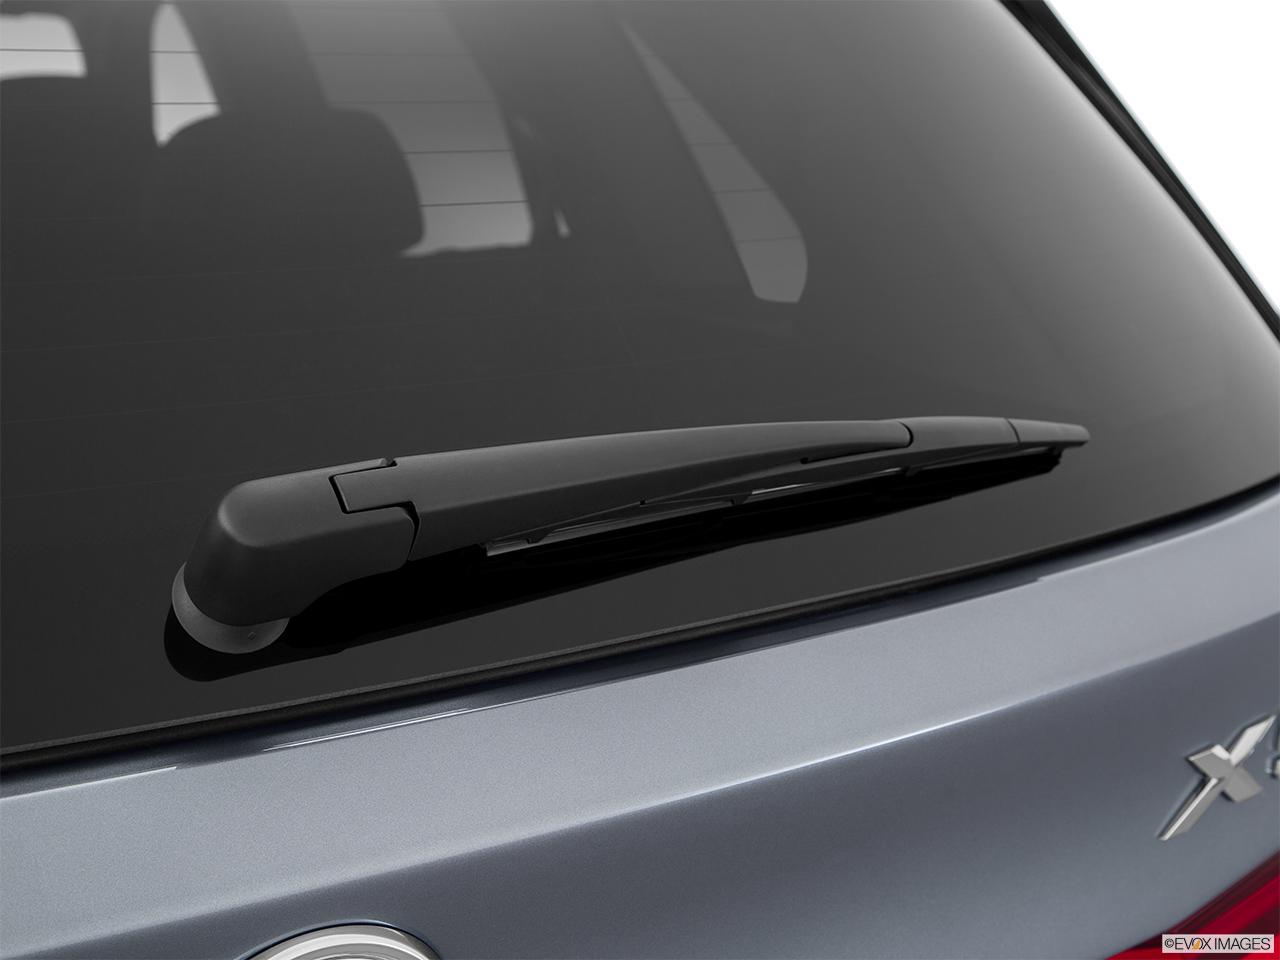 2015 Bmw X5 4 Door Xdrive35i Rear Window Wiper